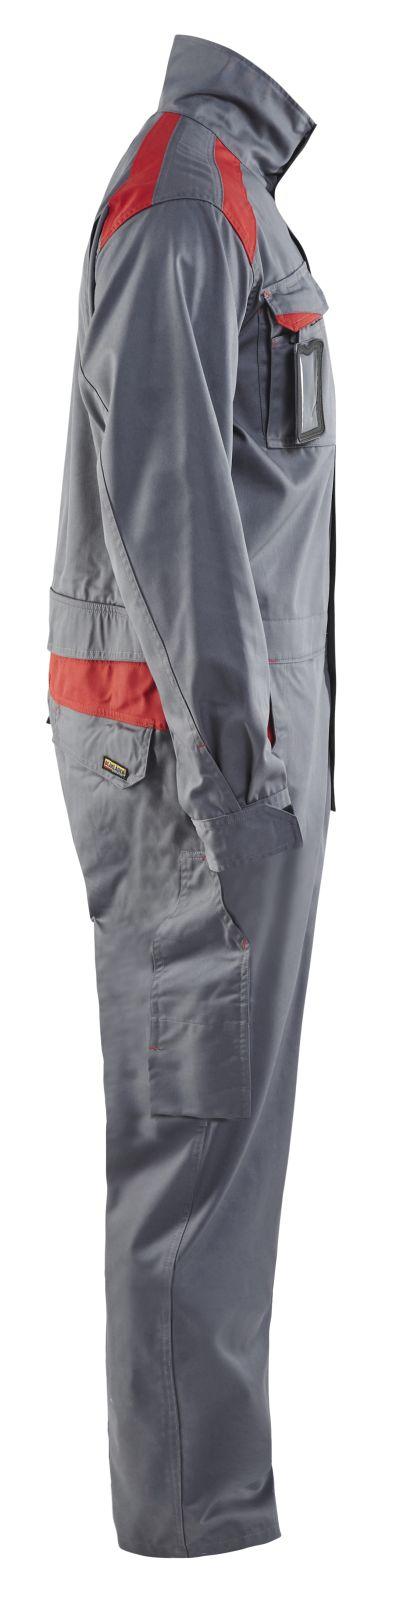 Blaklader Overalls 60541800 grijs-rood(9456)